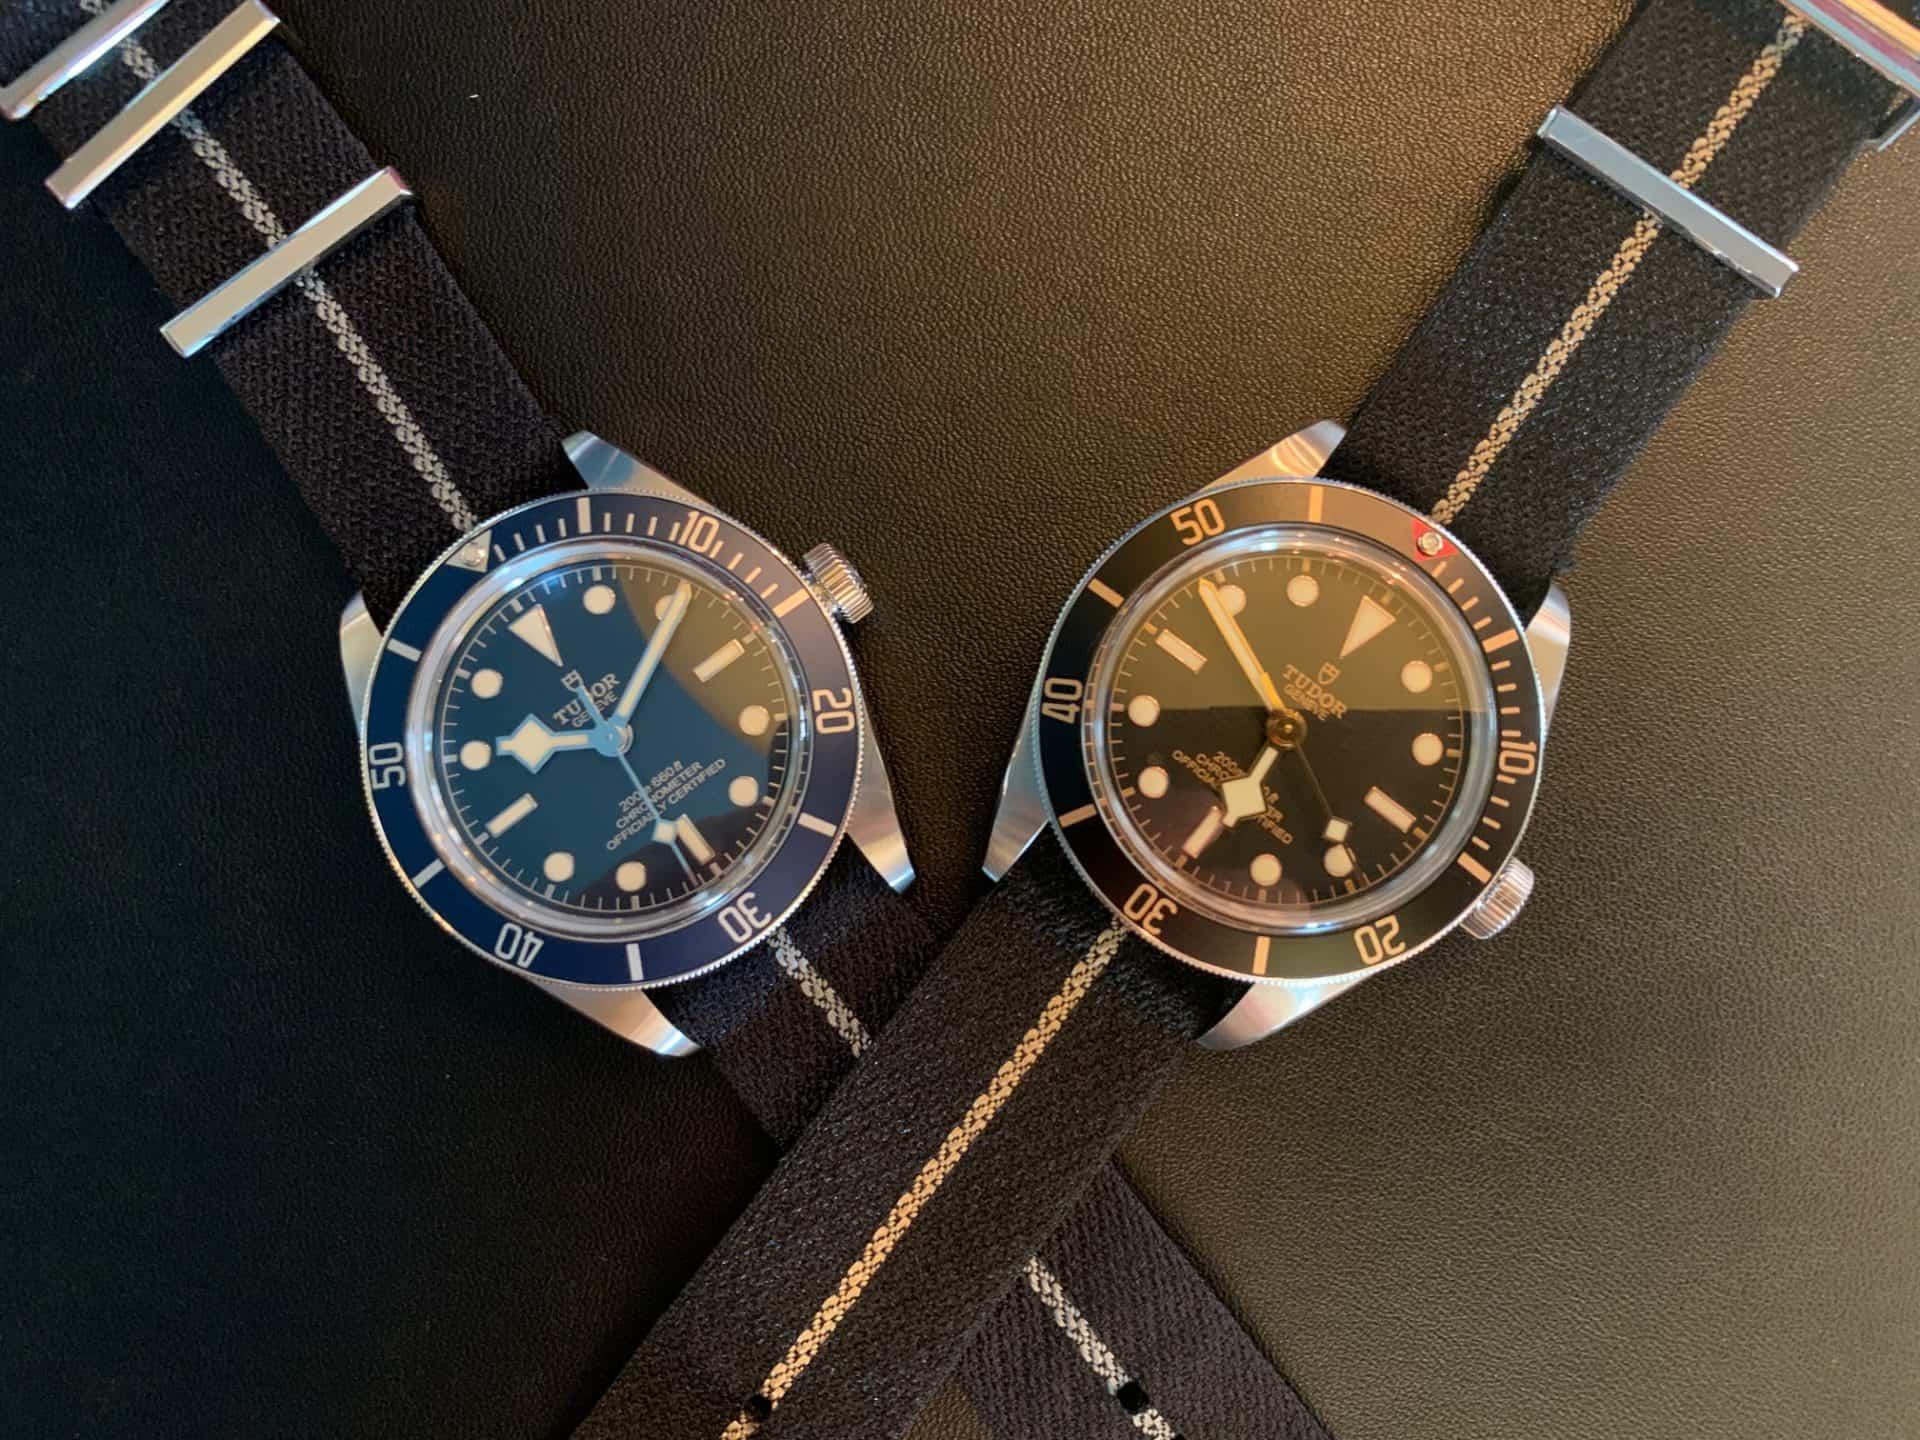 Tudor Black Bay Fifty-Eight Blue, 2020, und Tudor Fifty-Eight von 2018.